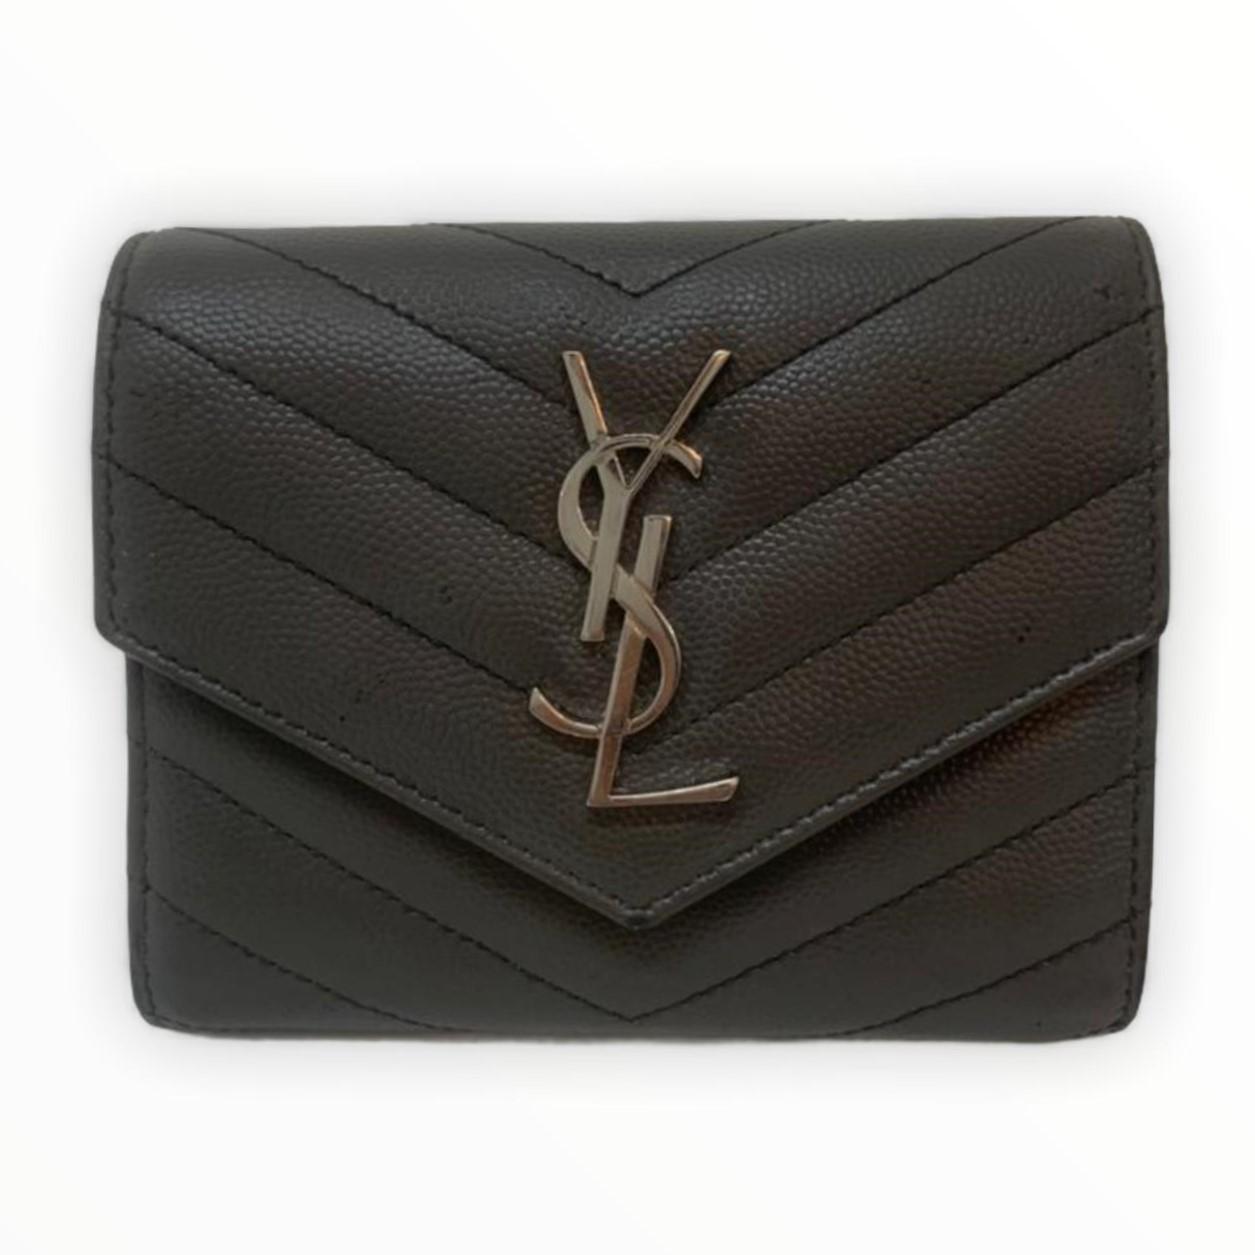 Carteira Yves Saint Laurent Envelope Cinza